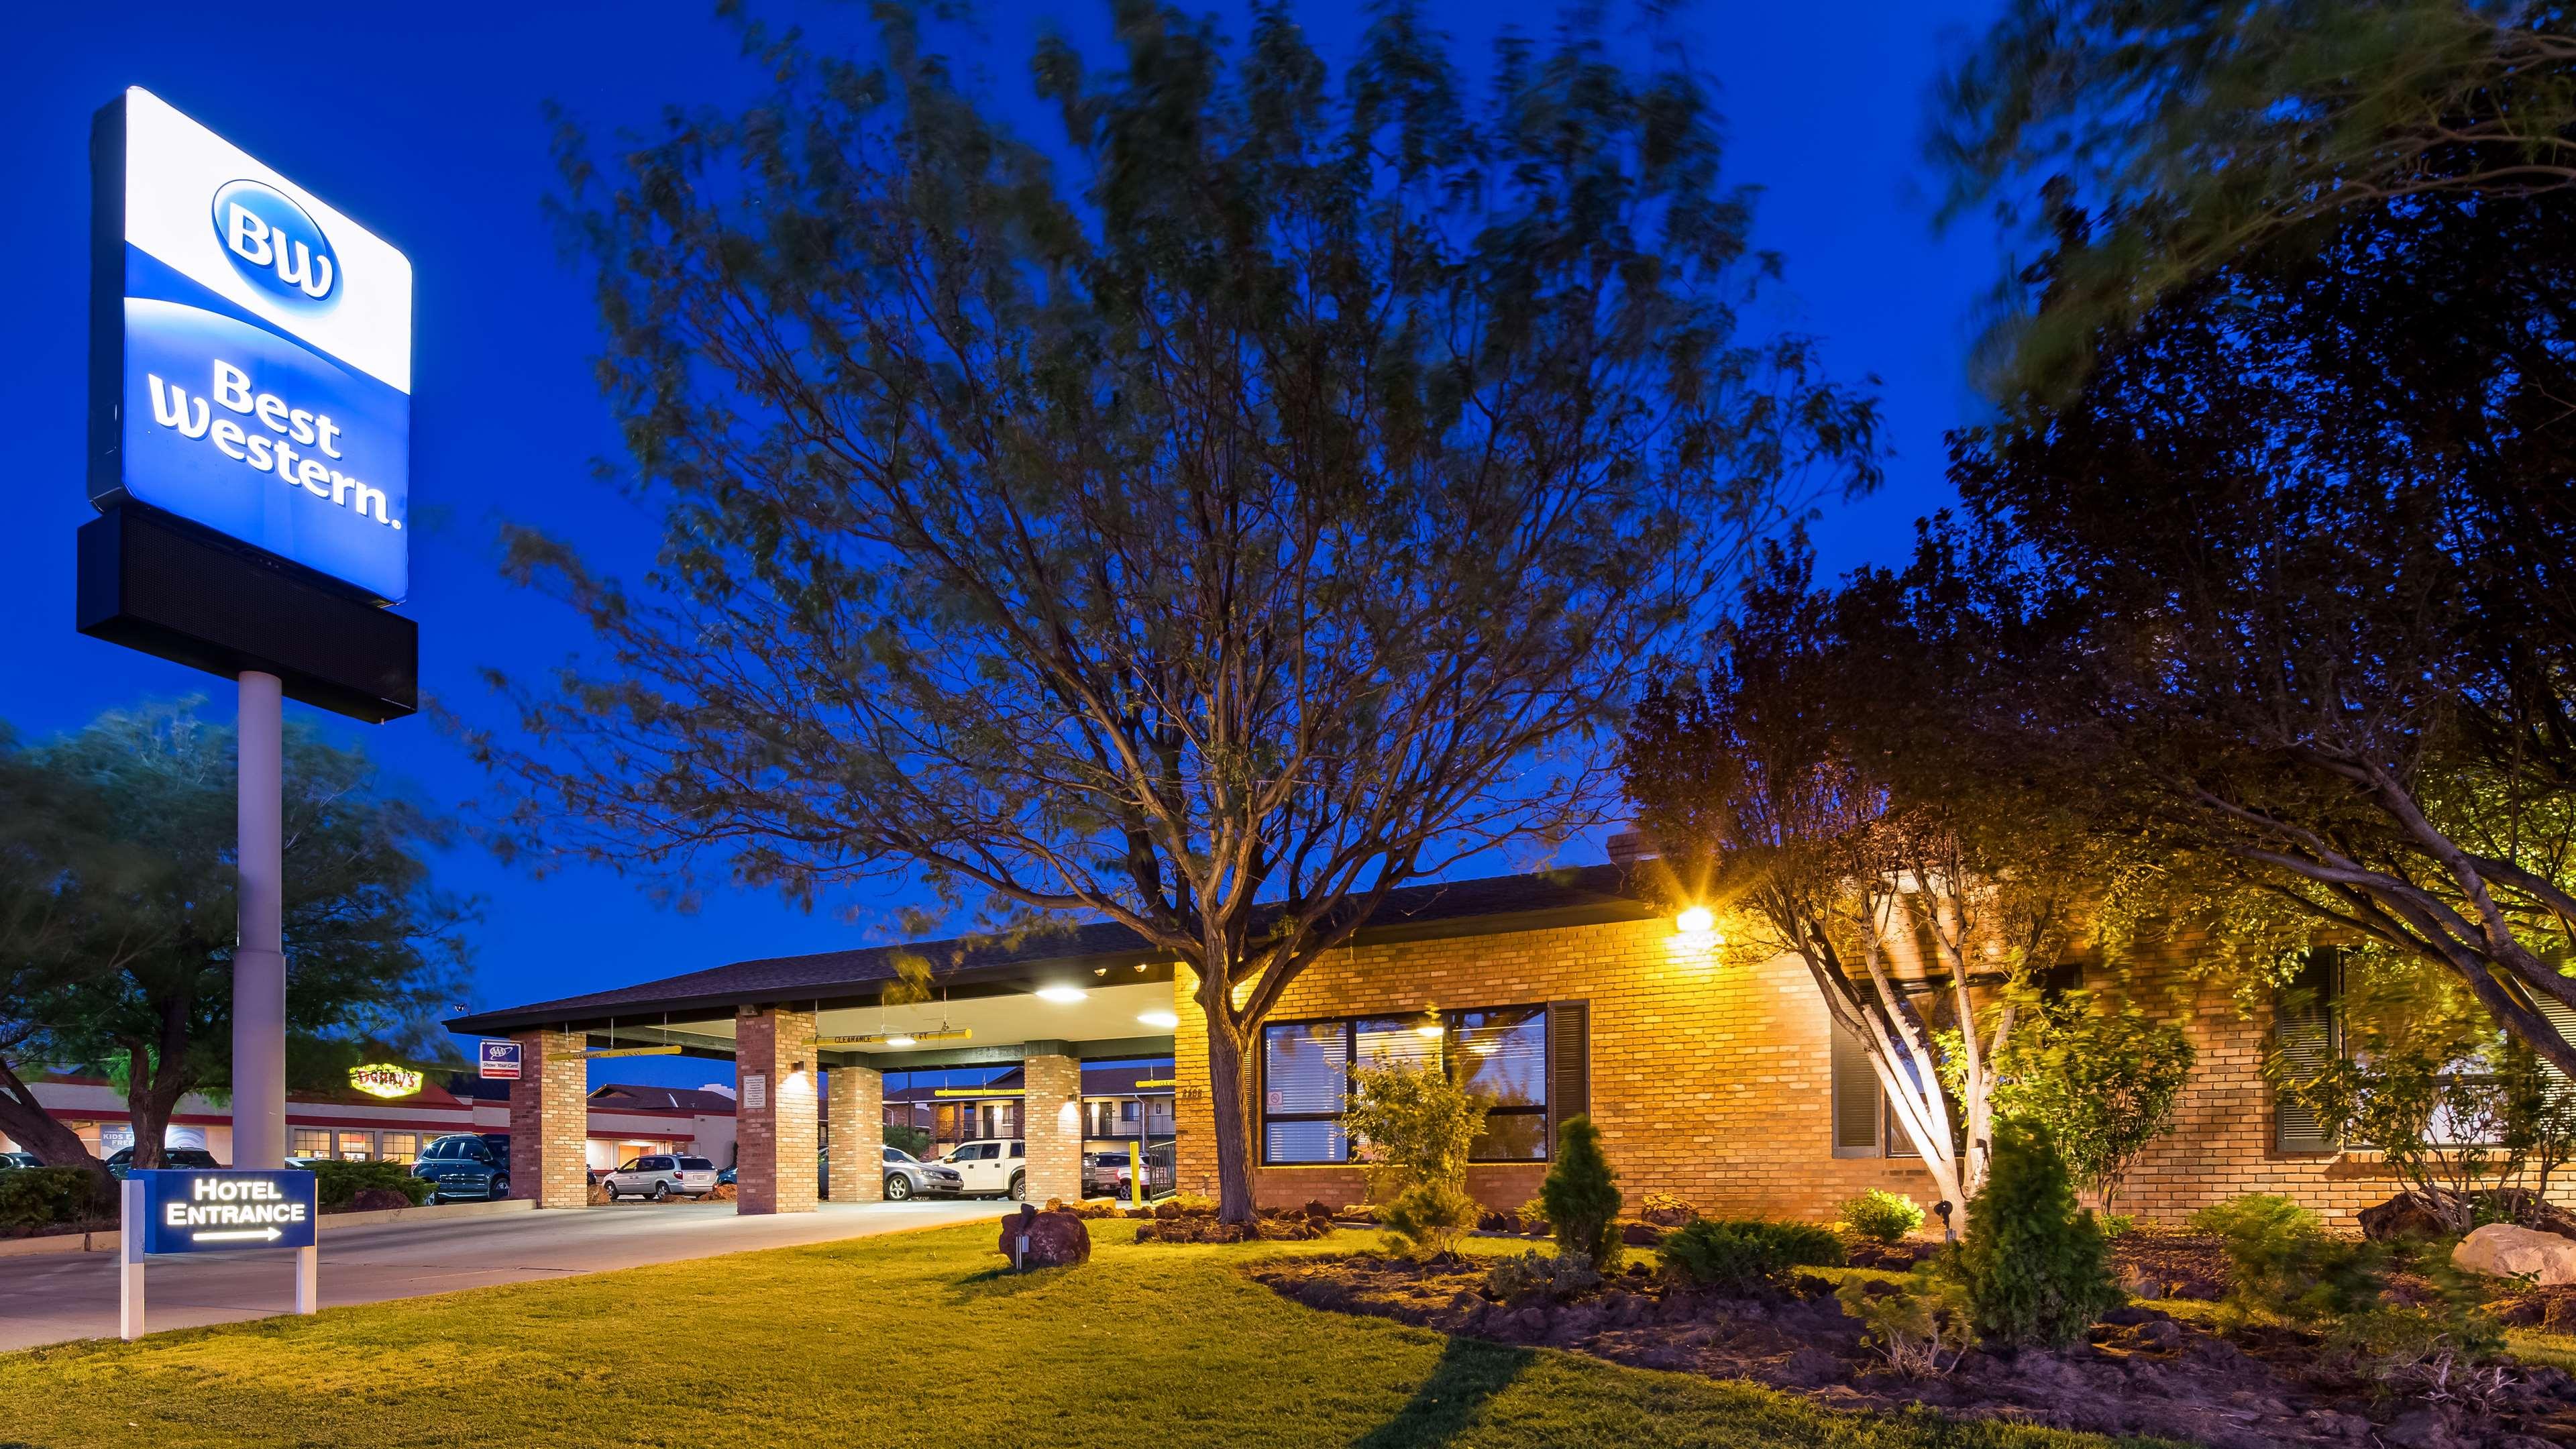 Best Western Arizonian Inn image 1